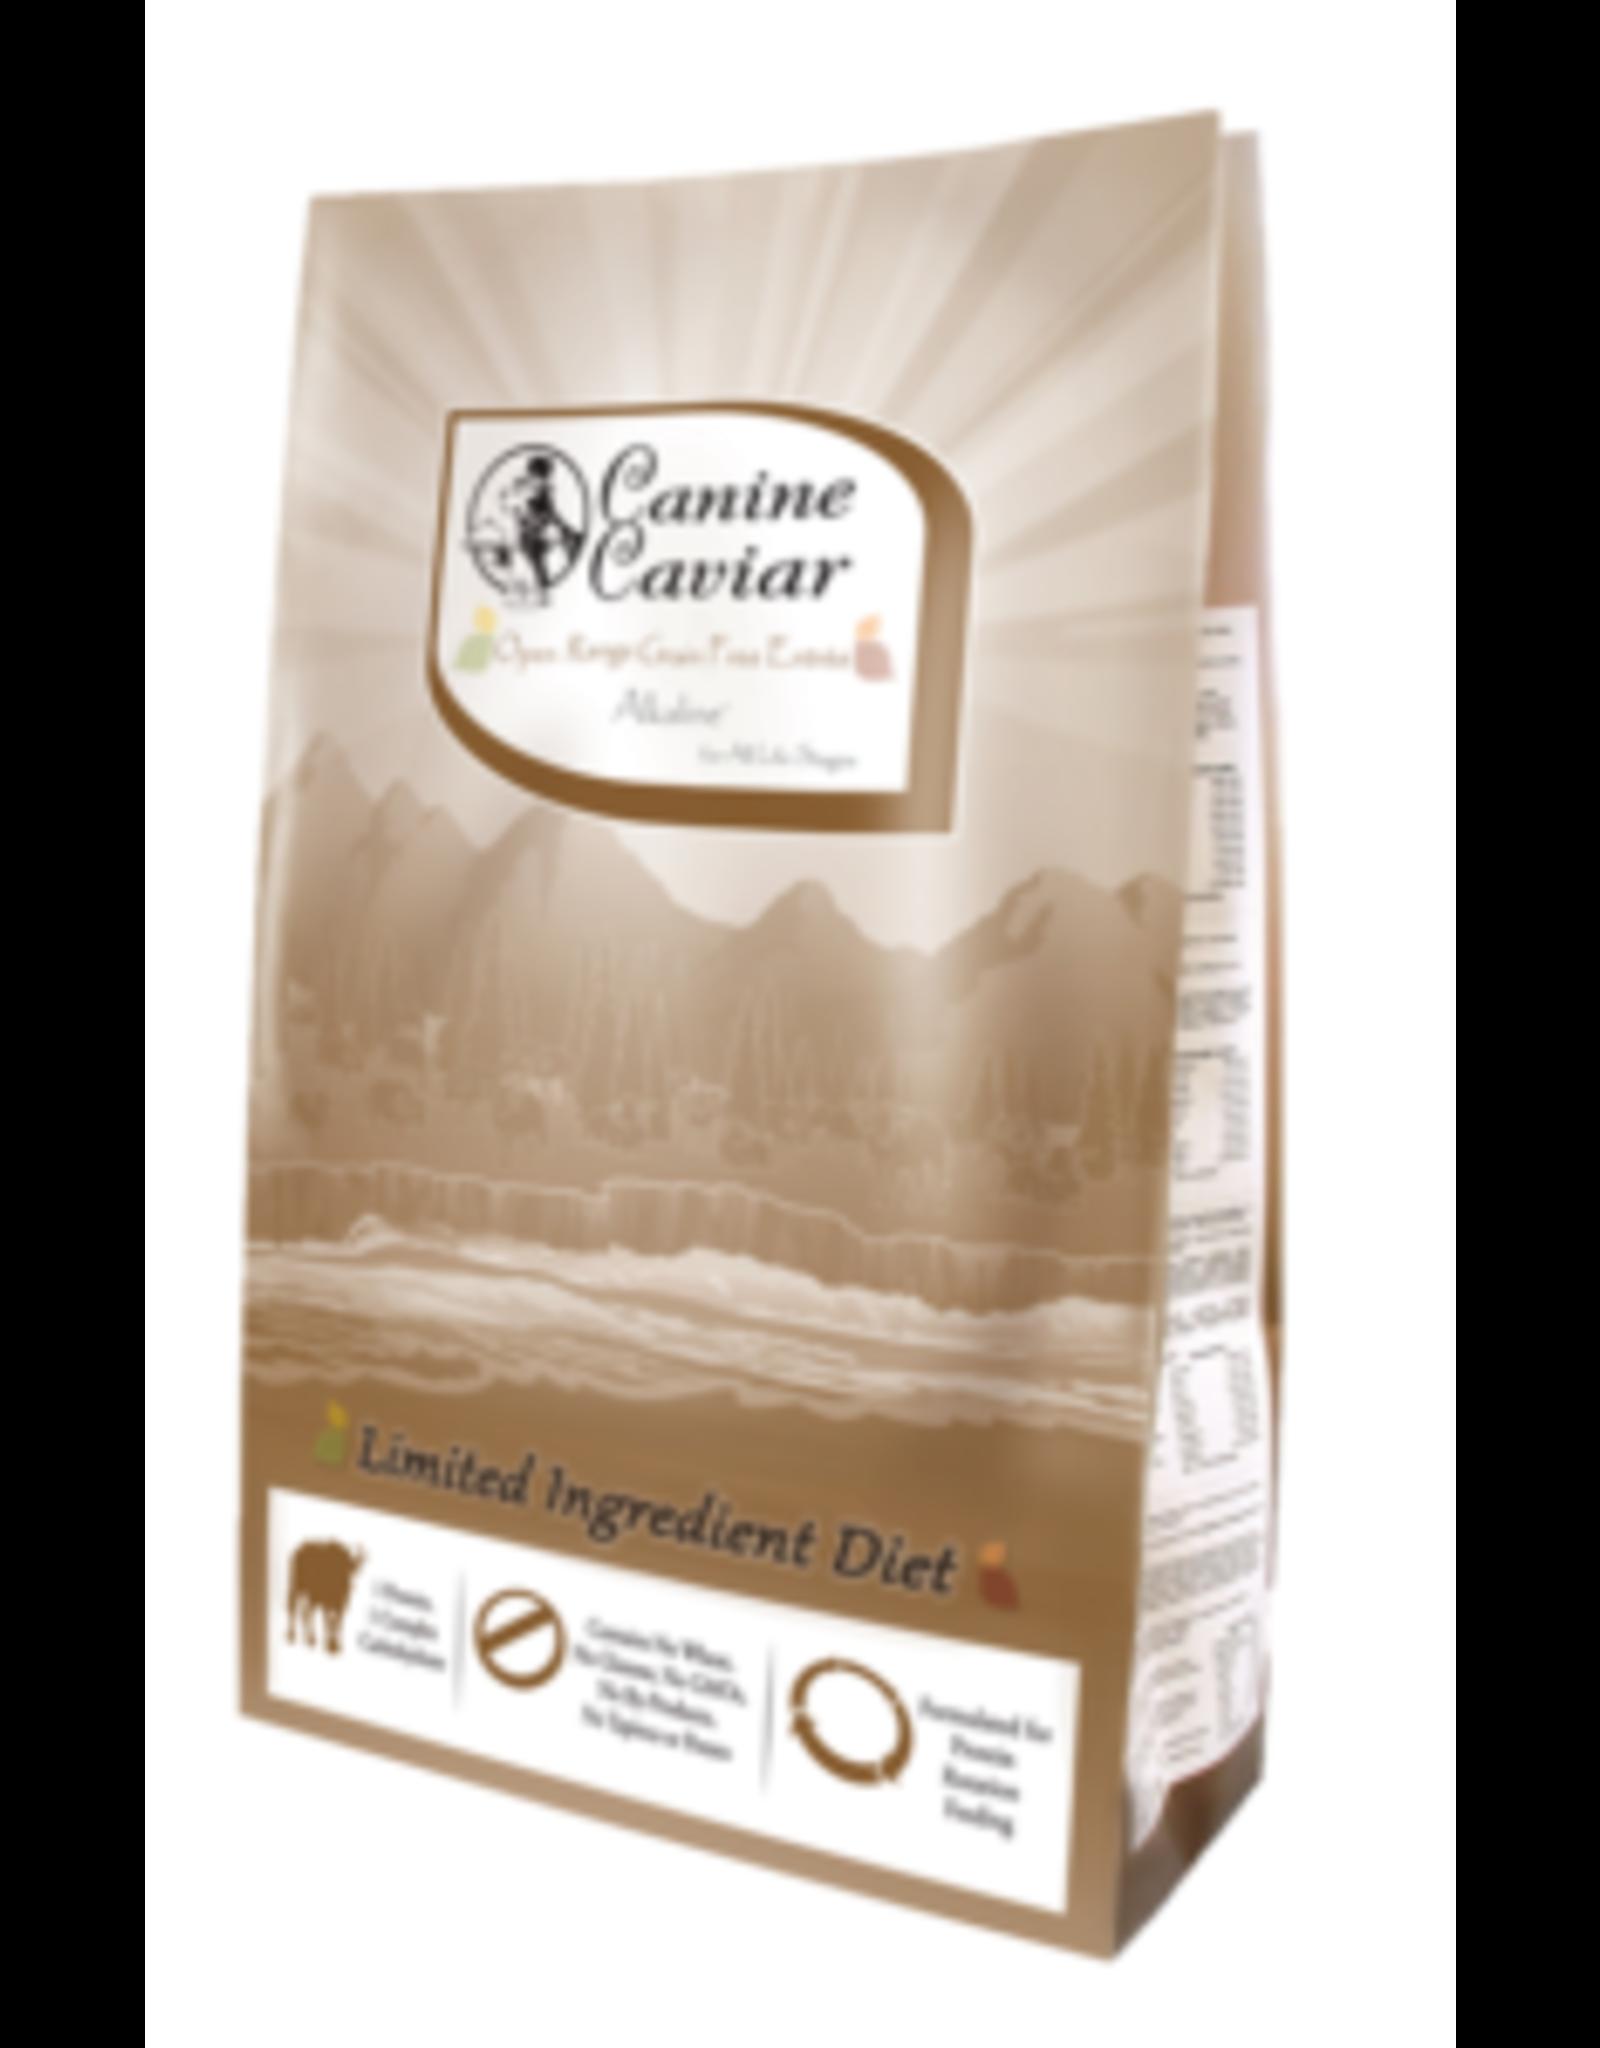 Canine Caviar CanineCaviar - Buffalo & Chickpea 11lb